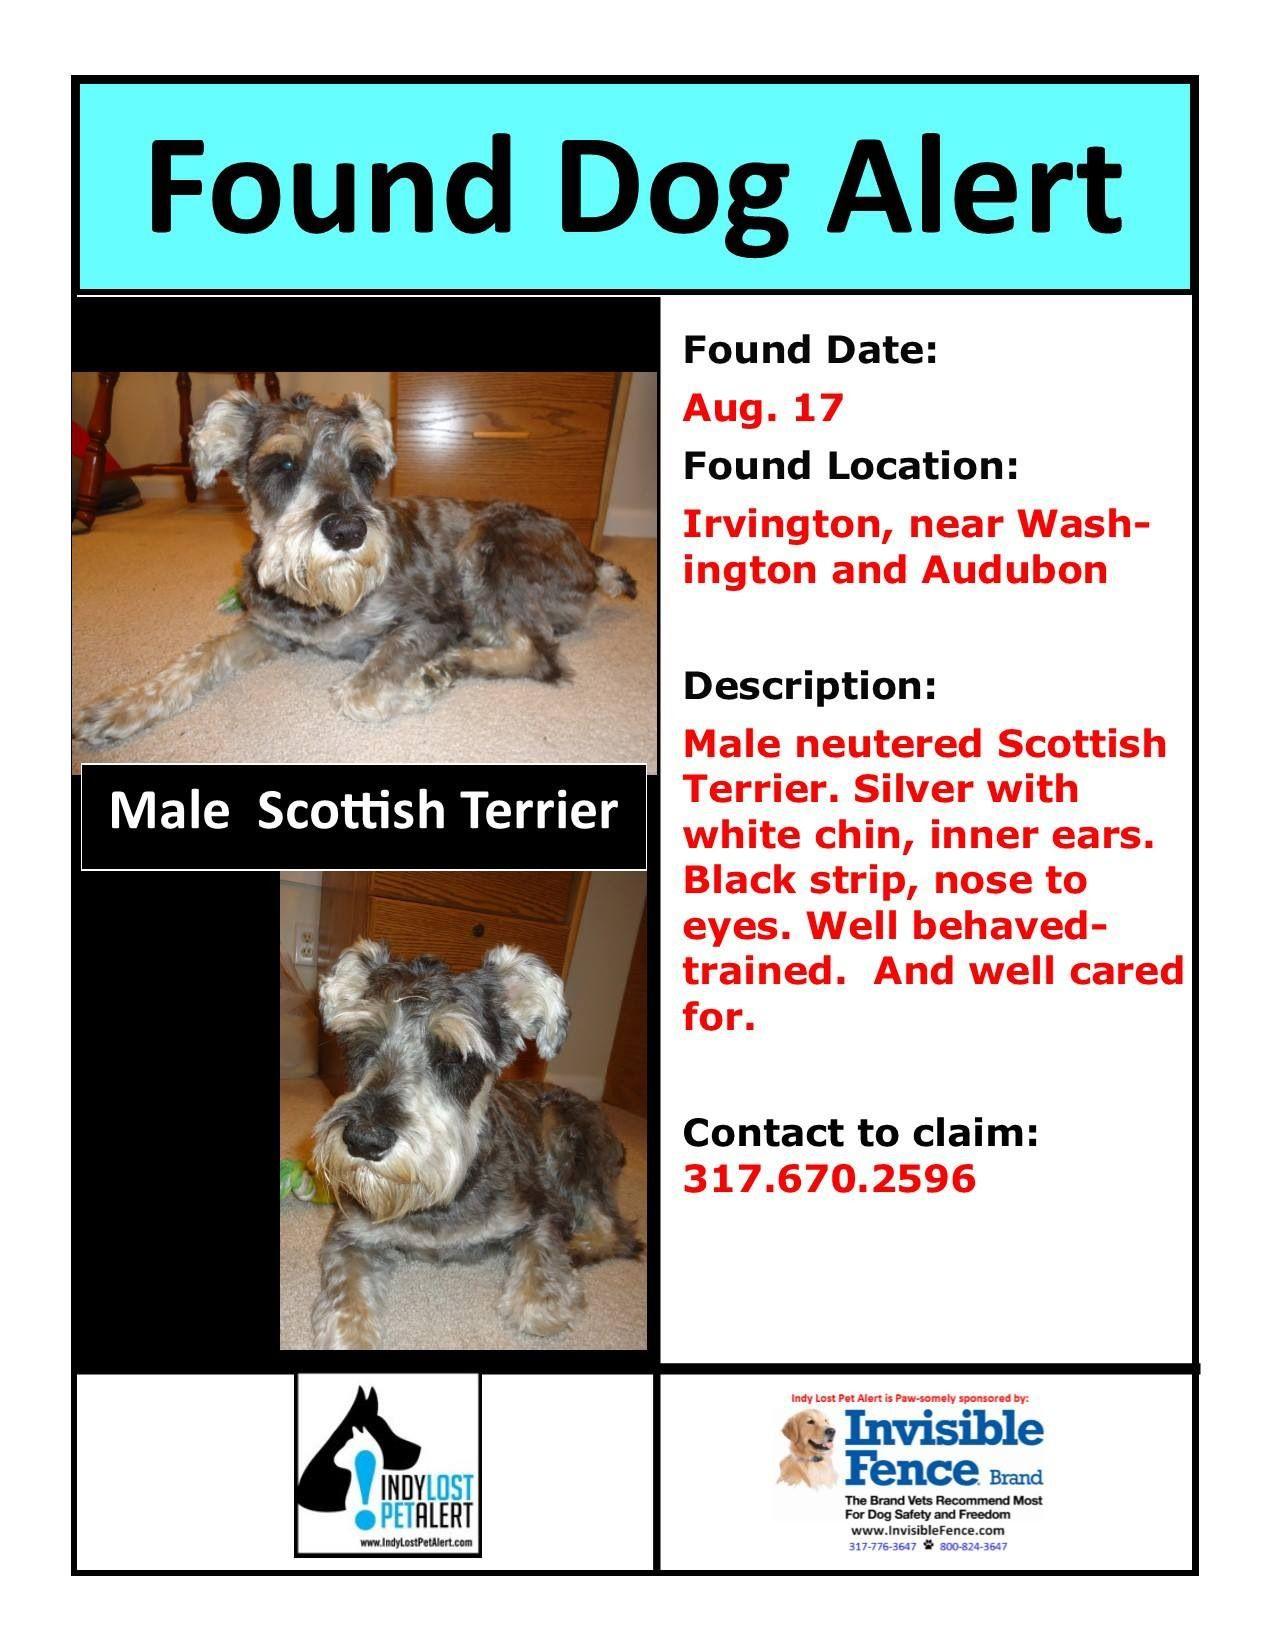 Irvington Indianapolis In Washington And Audubon Founddog 8 17 13 Neutered Male Scottish Terrier Or Schnauzer Https Losing A Dog Irvington Find Pets